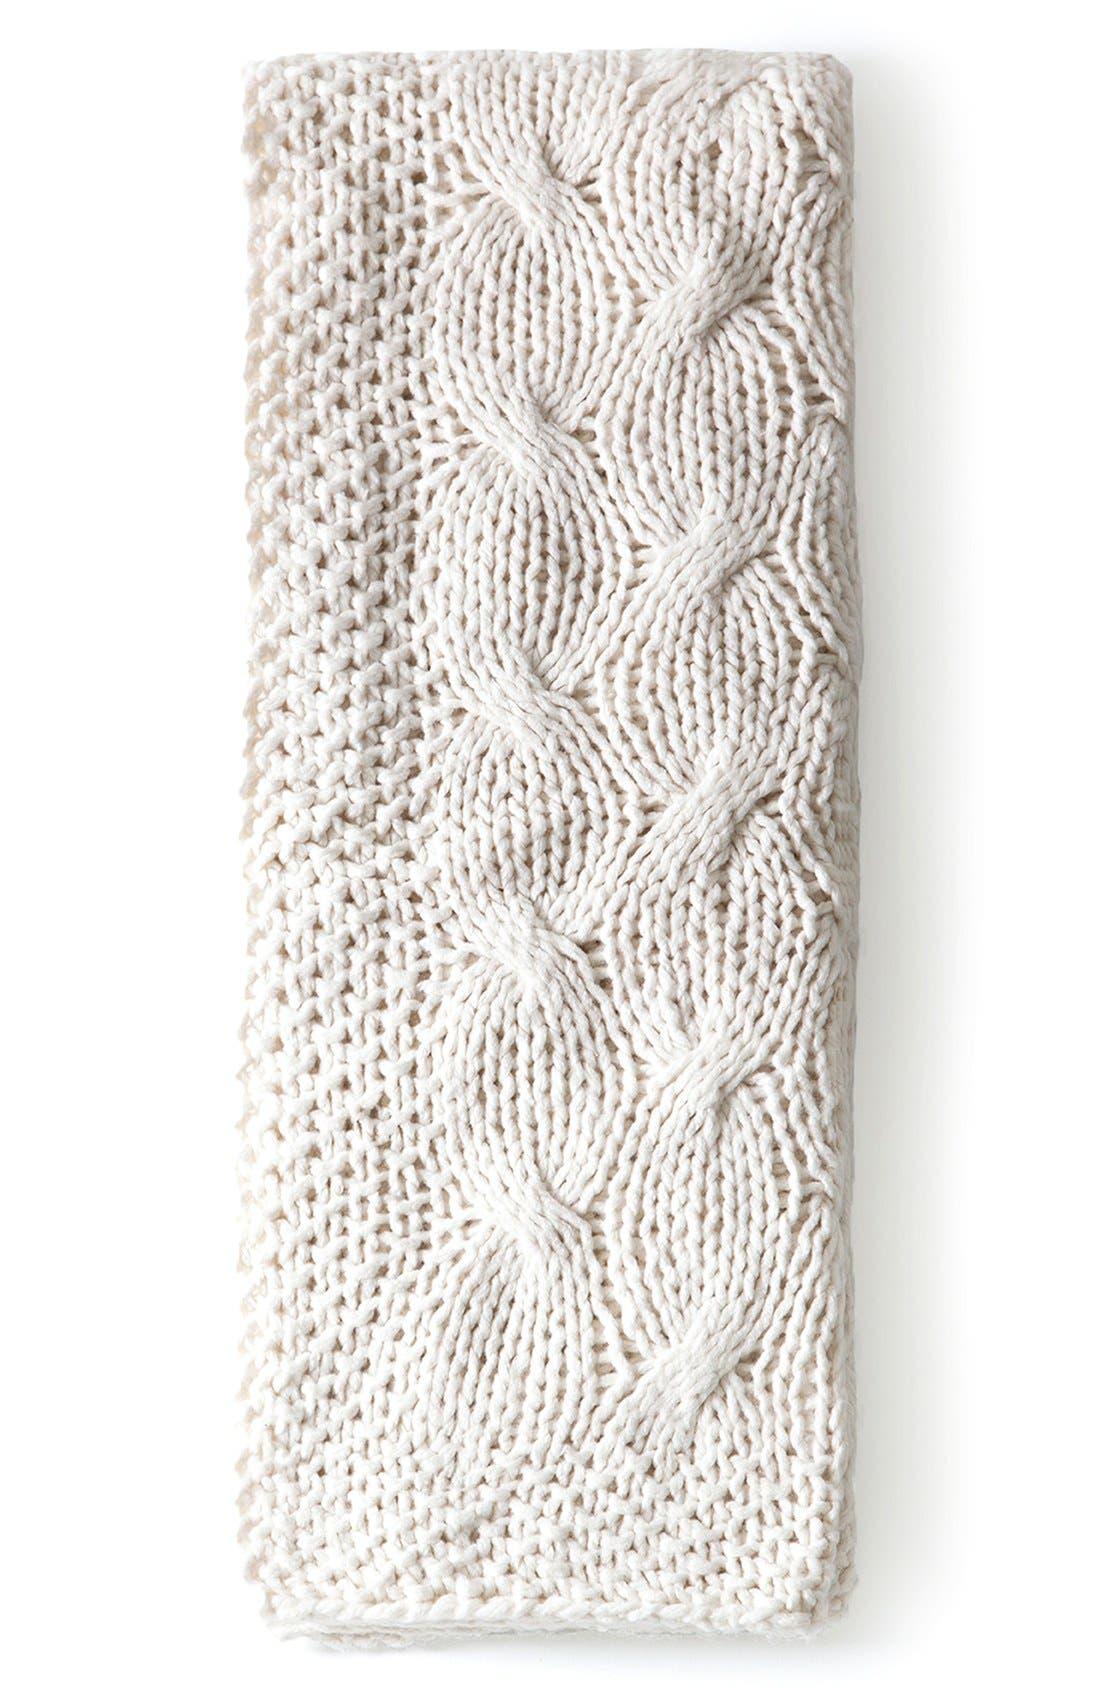 'Malibu' Throw,                         Main,                         color, Antique White